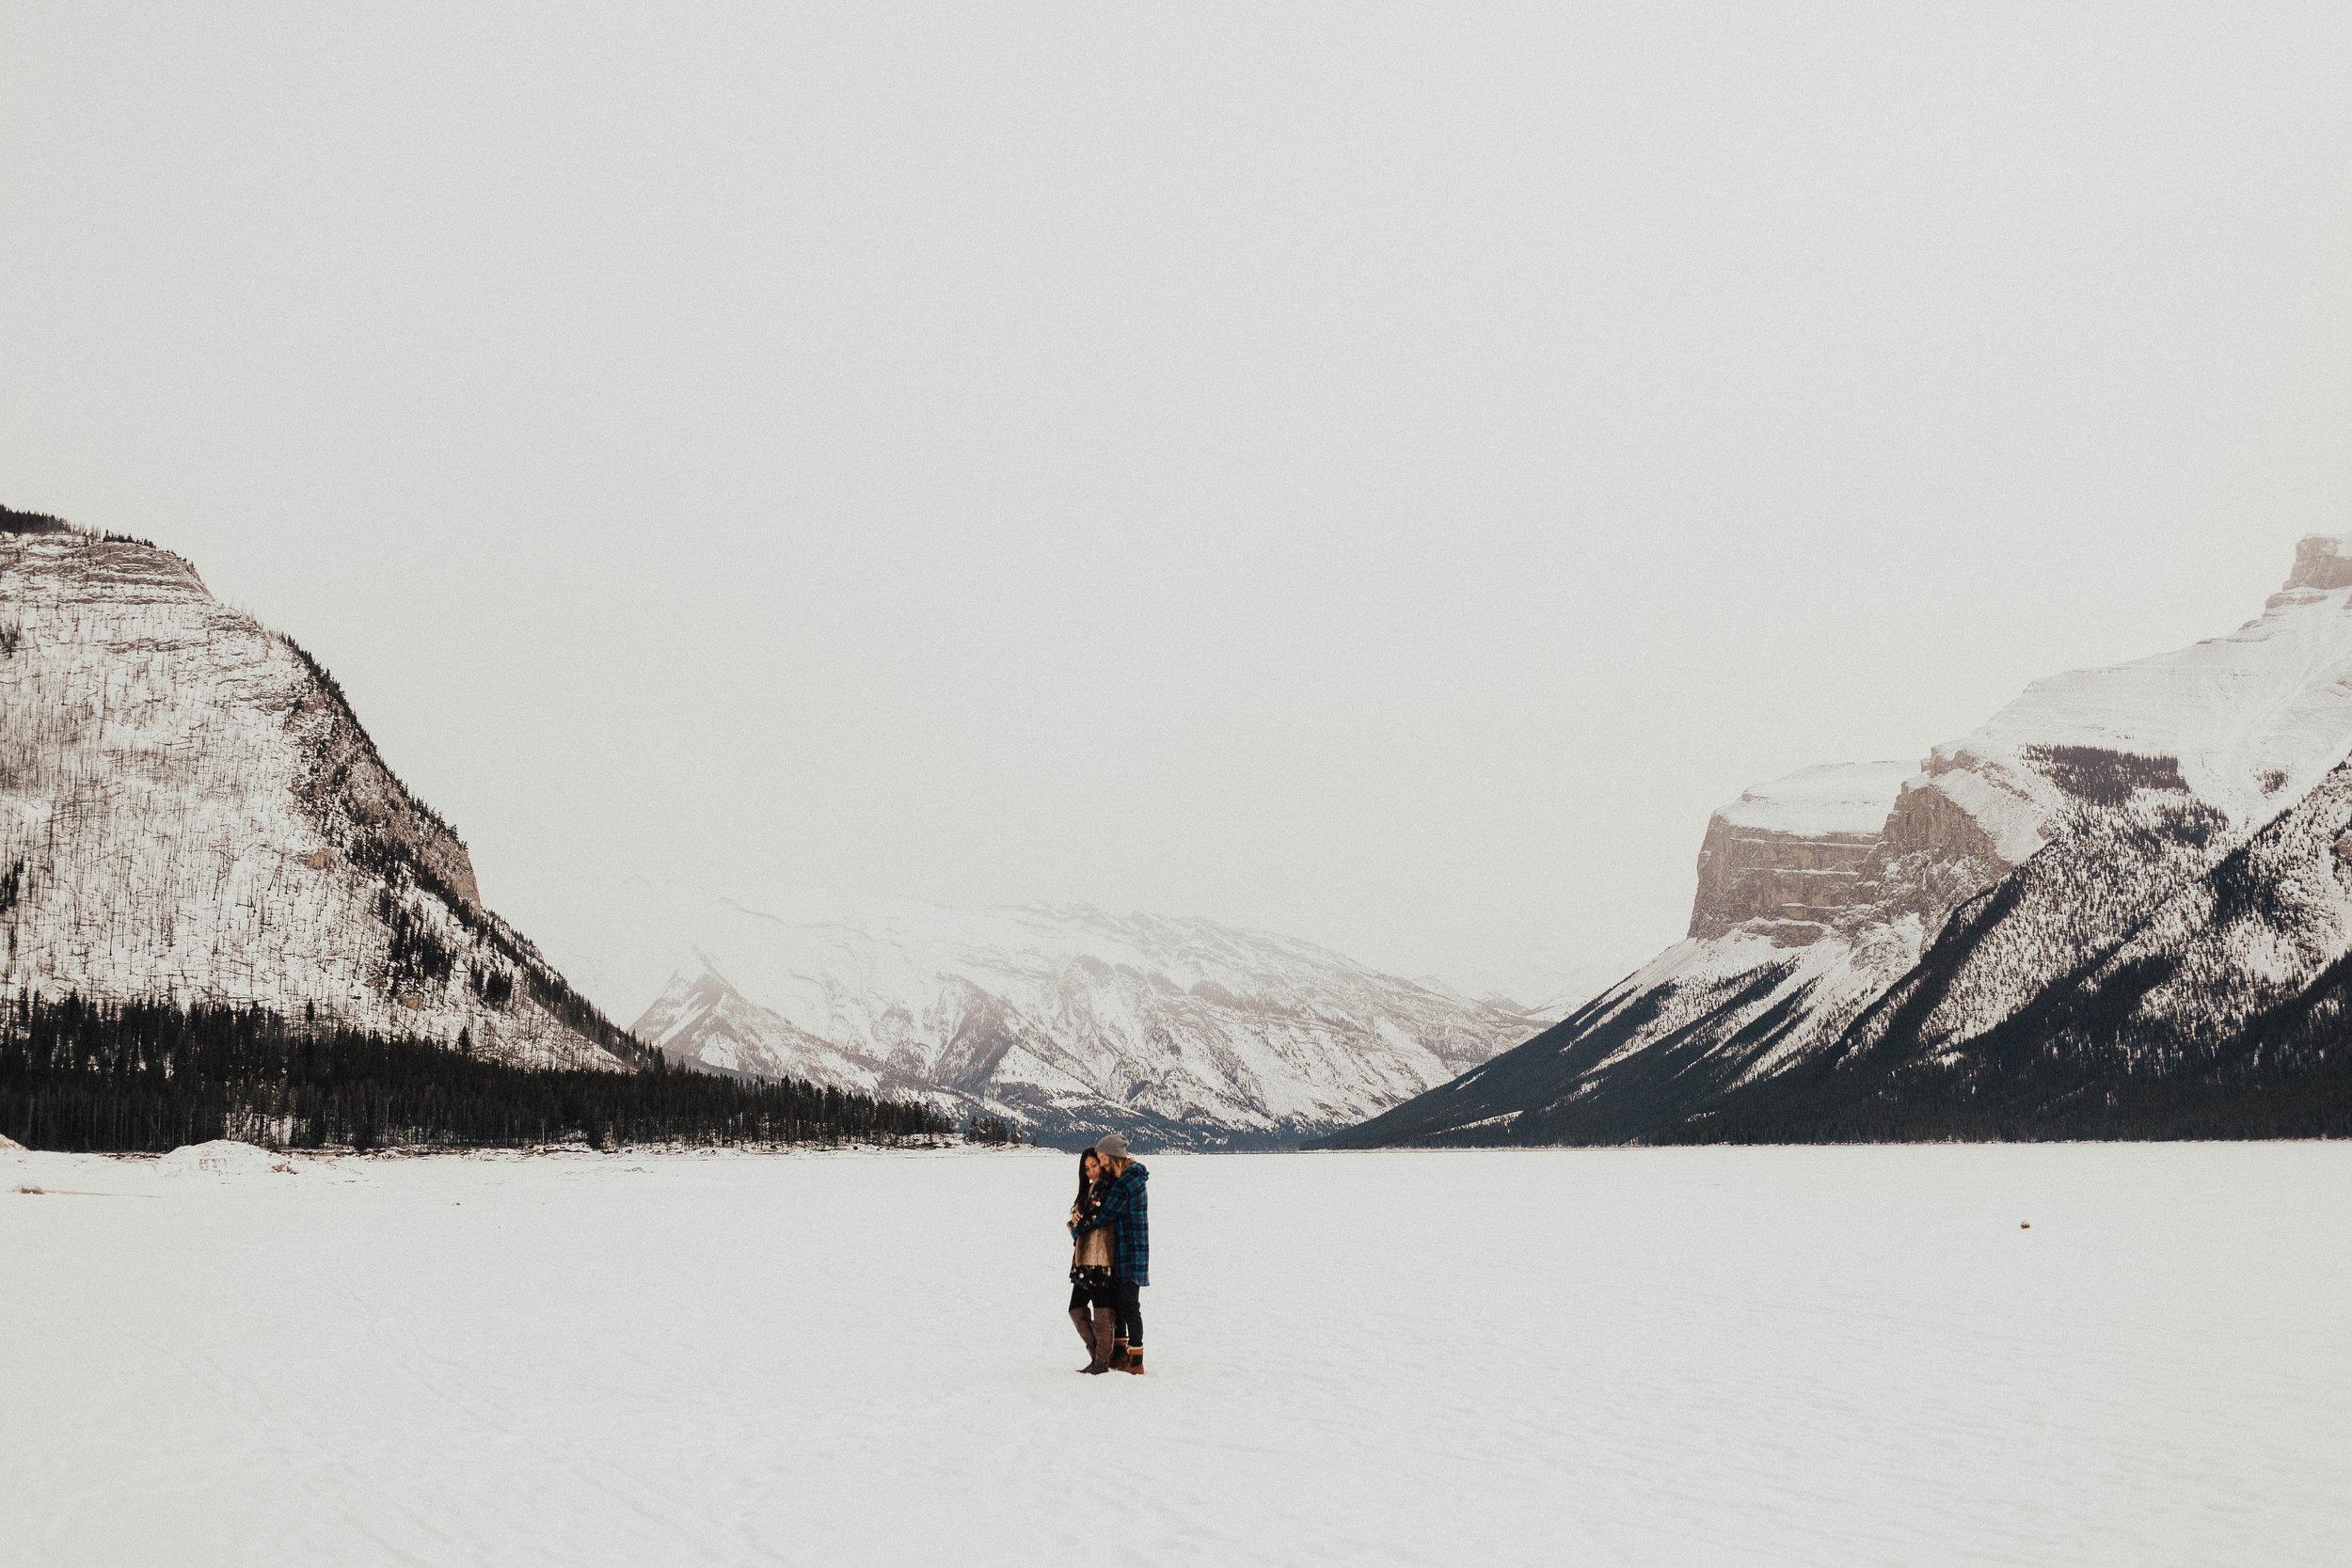 Banff Engagement Photographer - Winter Mountain Adventure Engagement Session - Michelle Larmand Photography-042